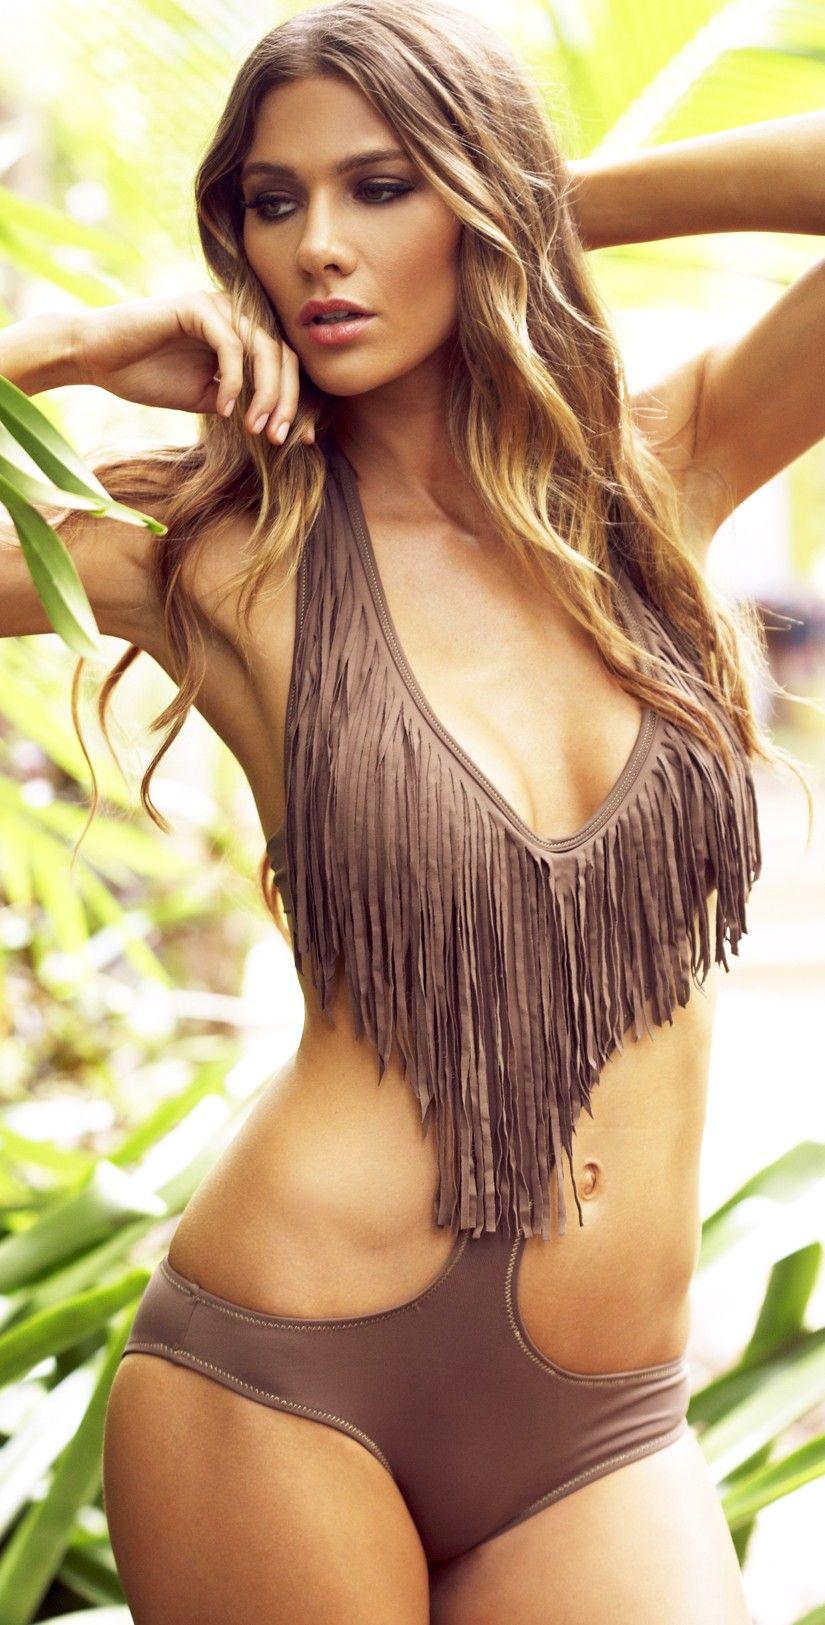 Girls long torso nude